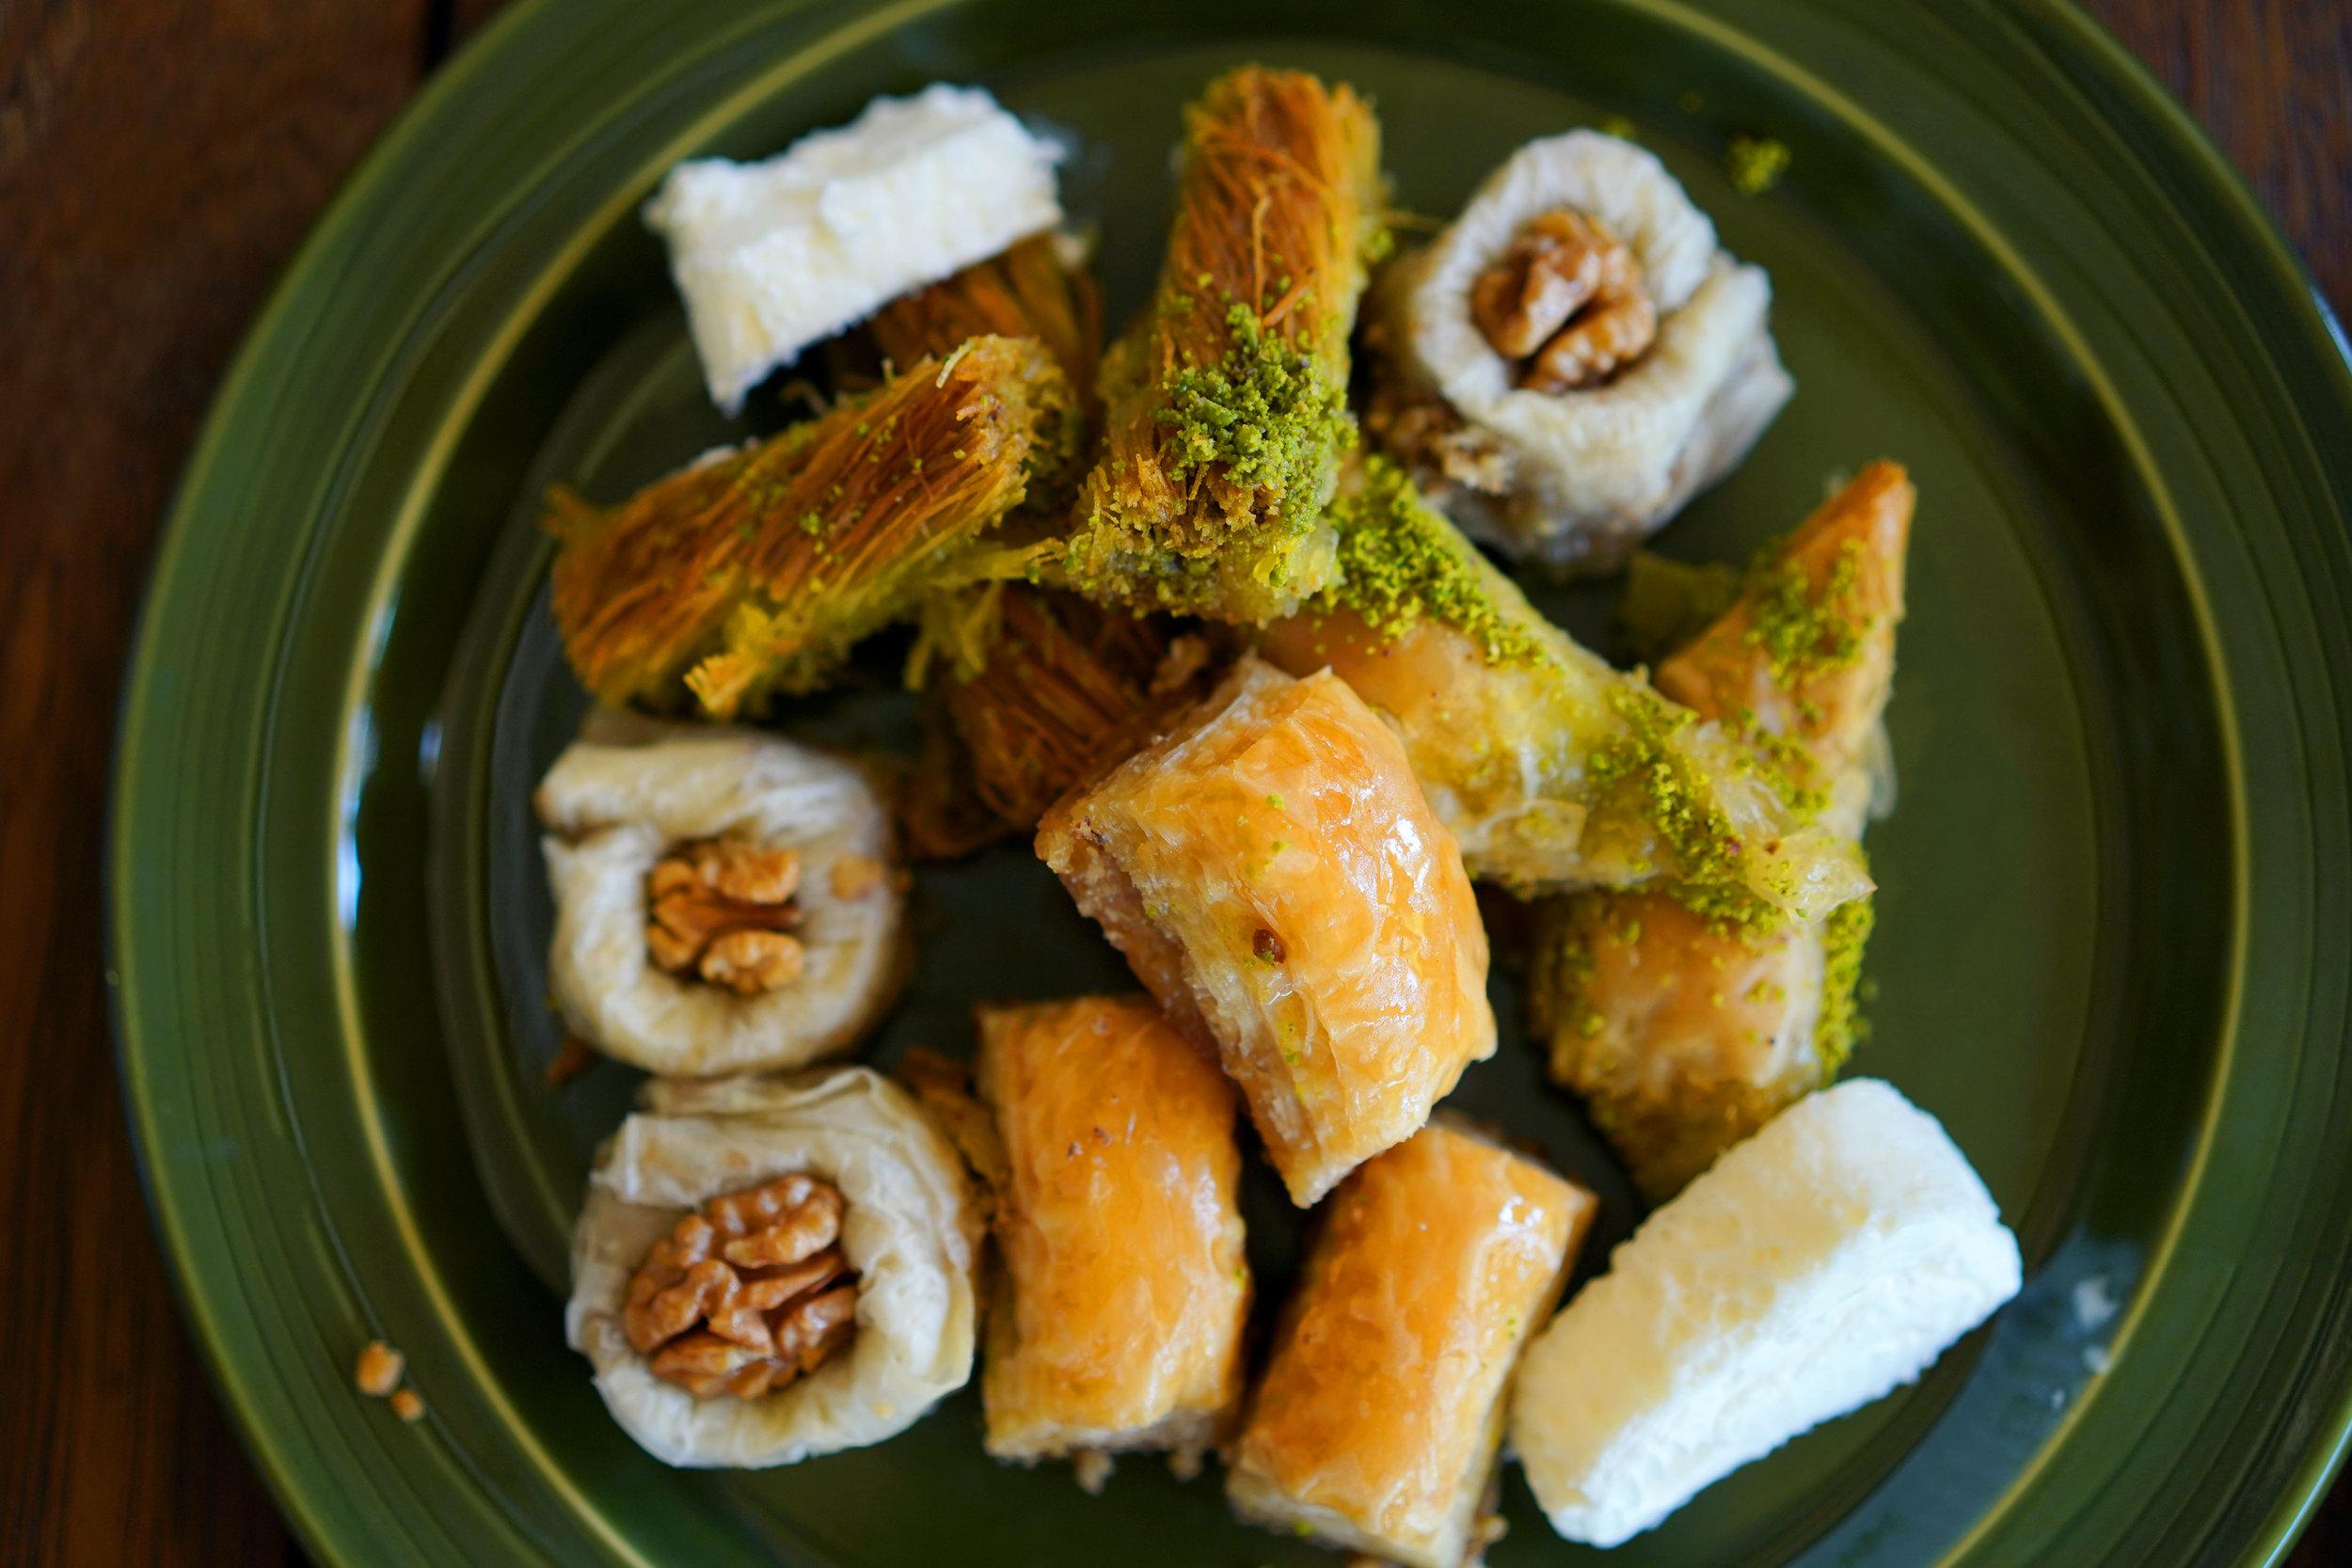 thetravelhub_istanbul_food11.JPG